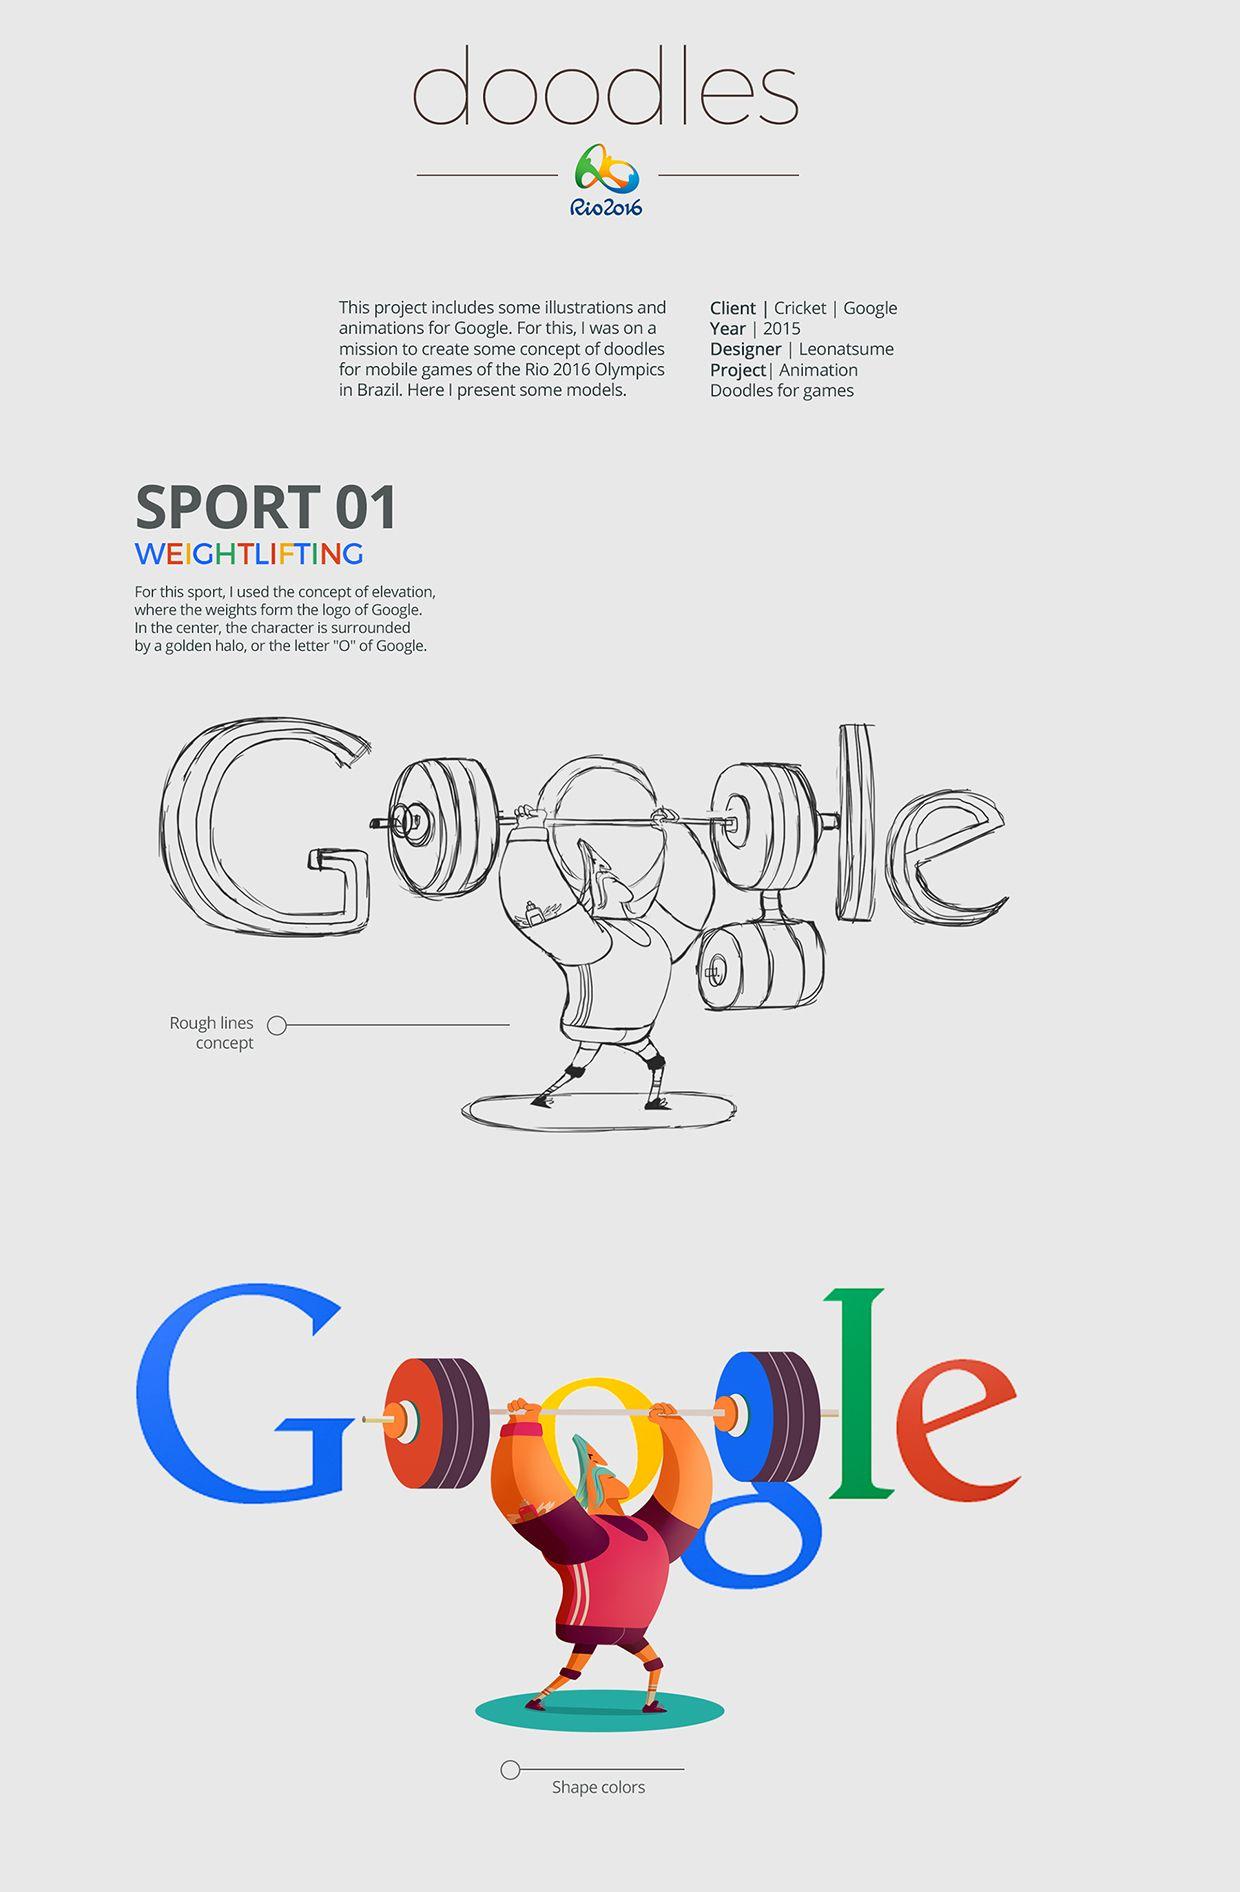 Rio 2016 Olympic Games Google Doodle Abduzeedo Design